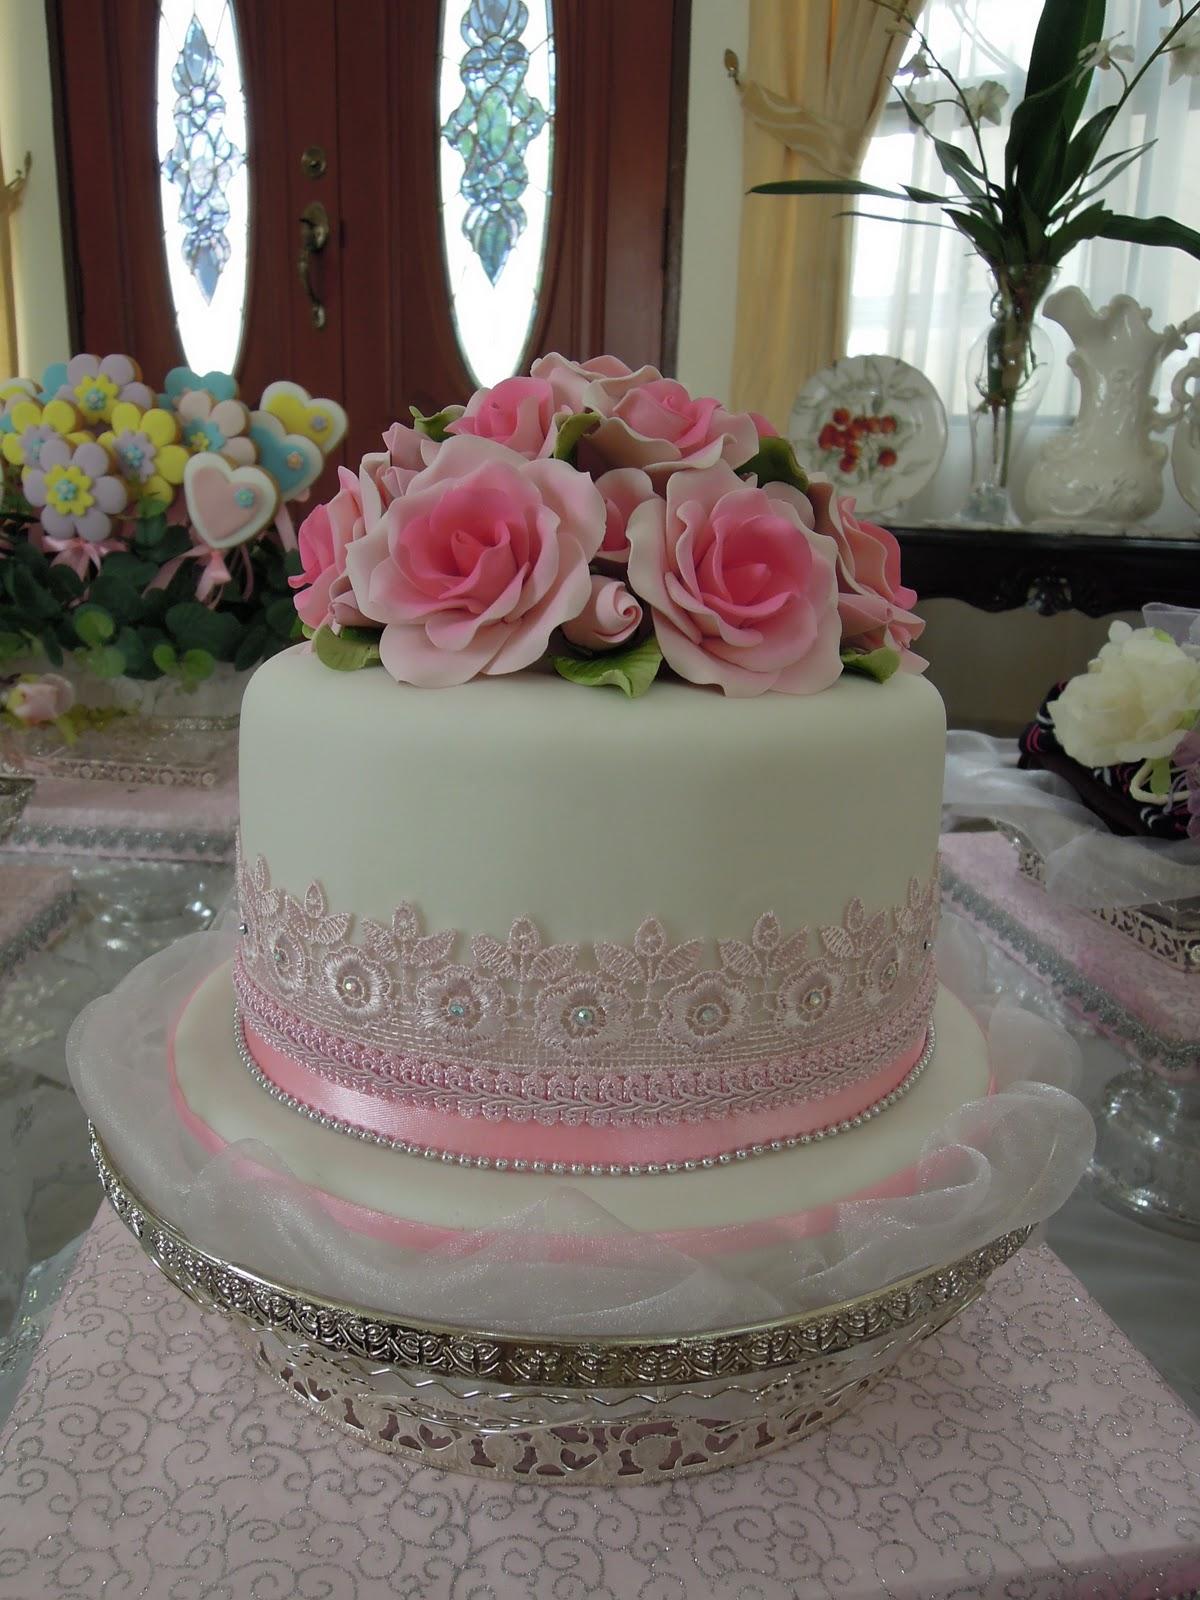 Pink Vanilla Cakes & Pastries Fondant Wedding Cake